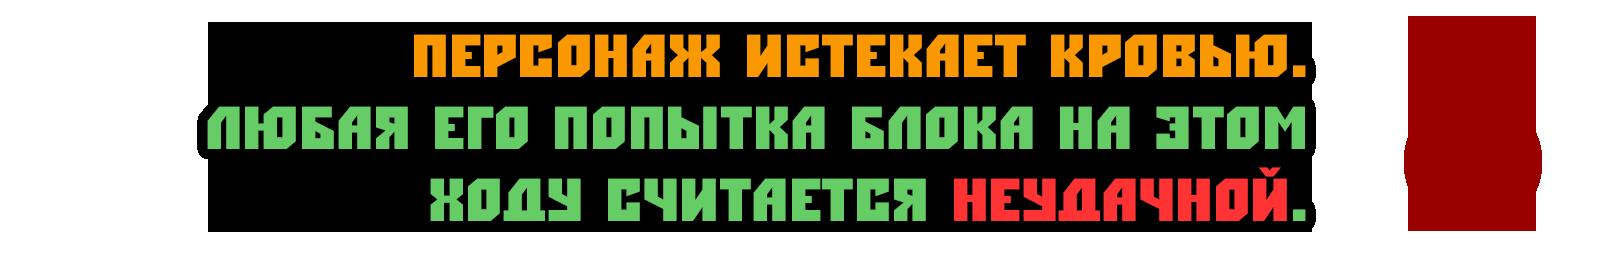 Тест боевой системы - Страница 8 O4ki_Urona_Krovote4enije_Forum_Vova_2